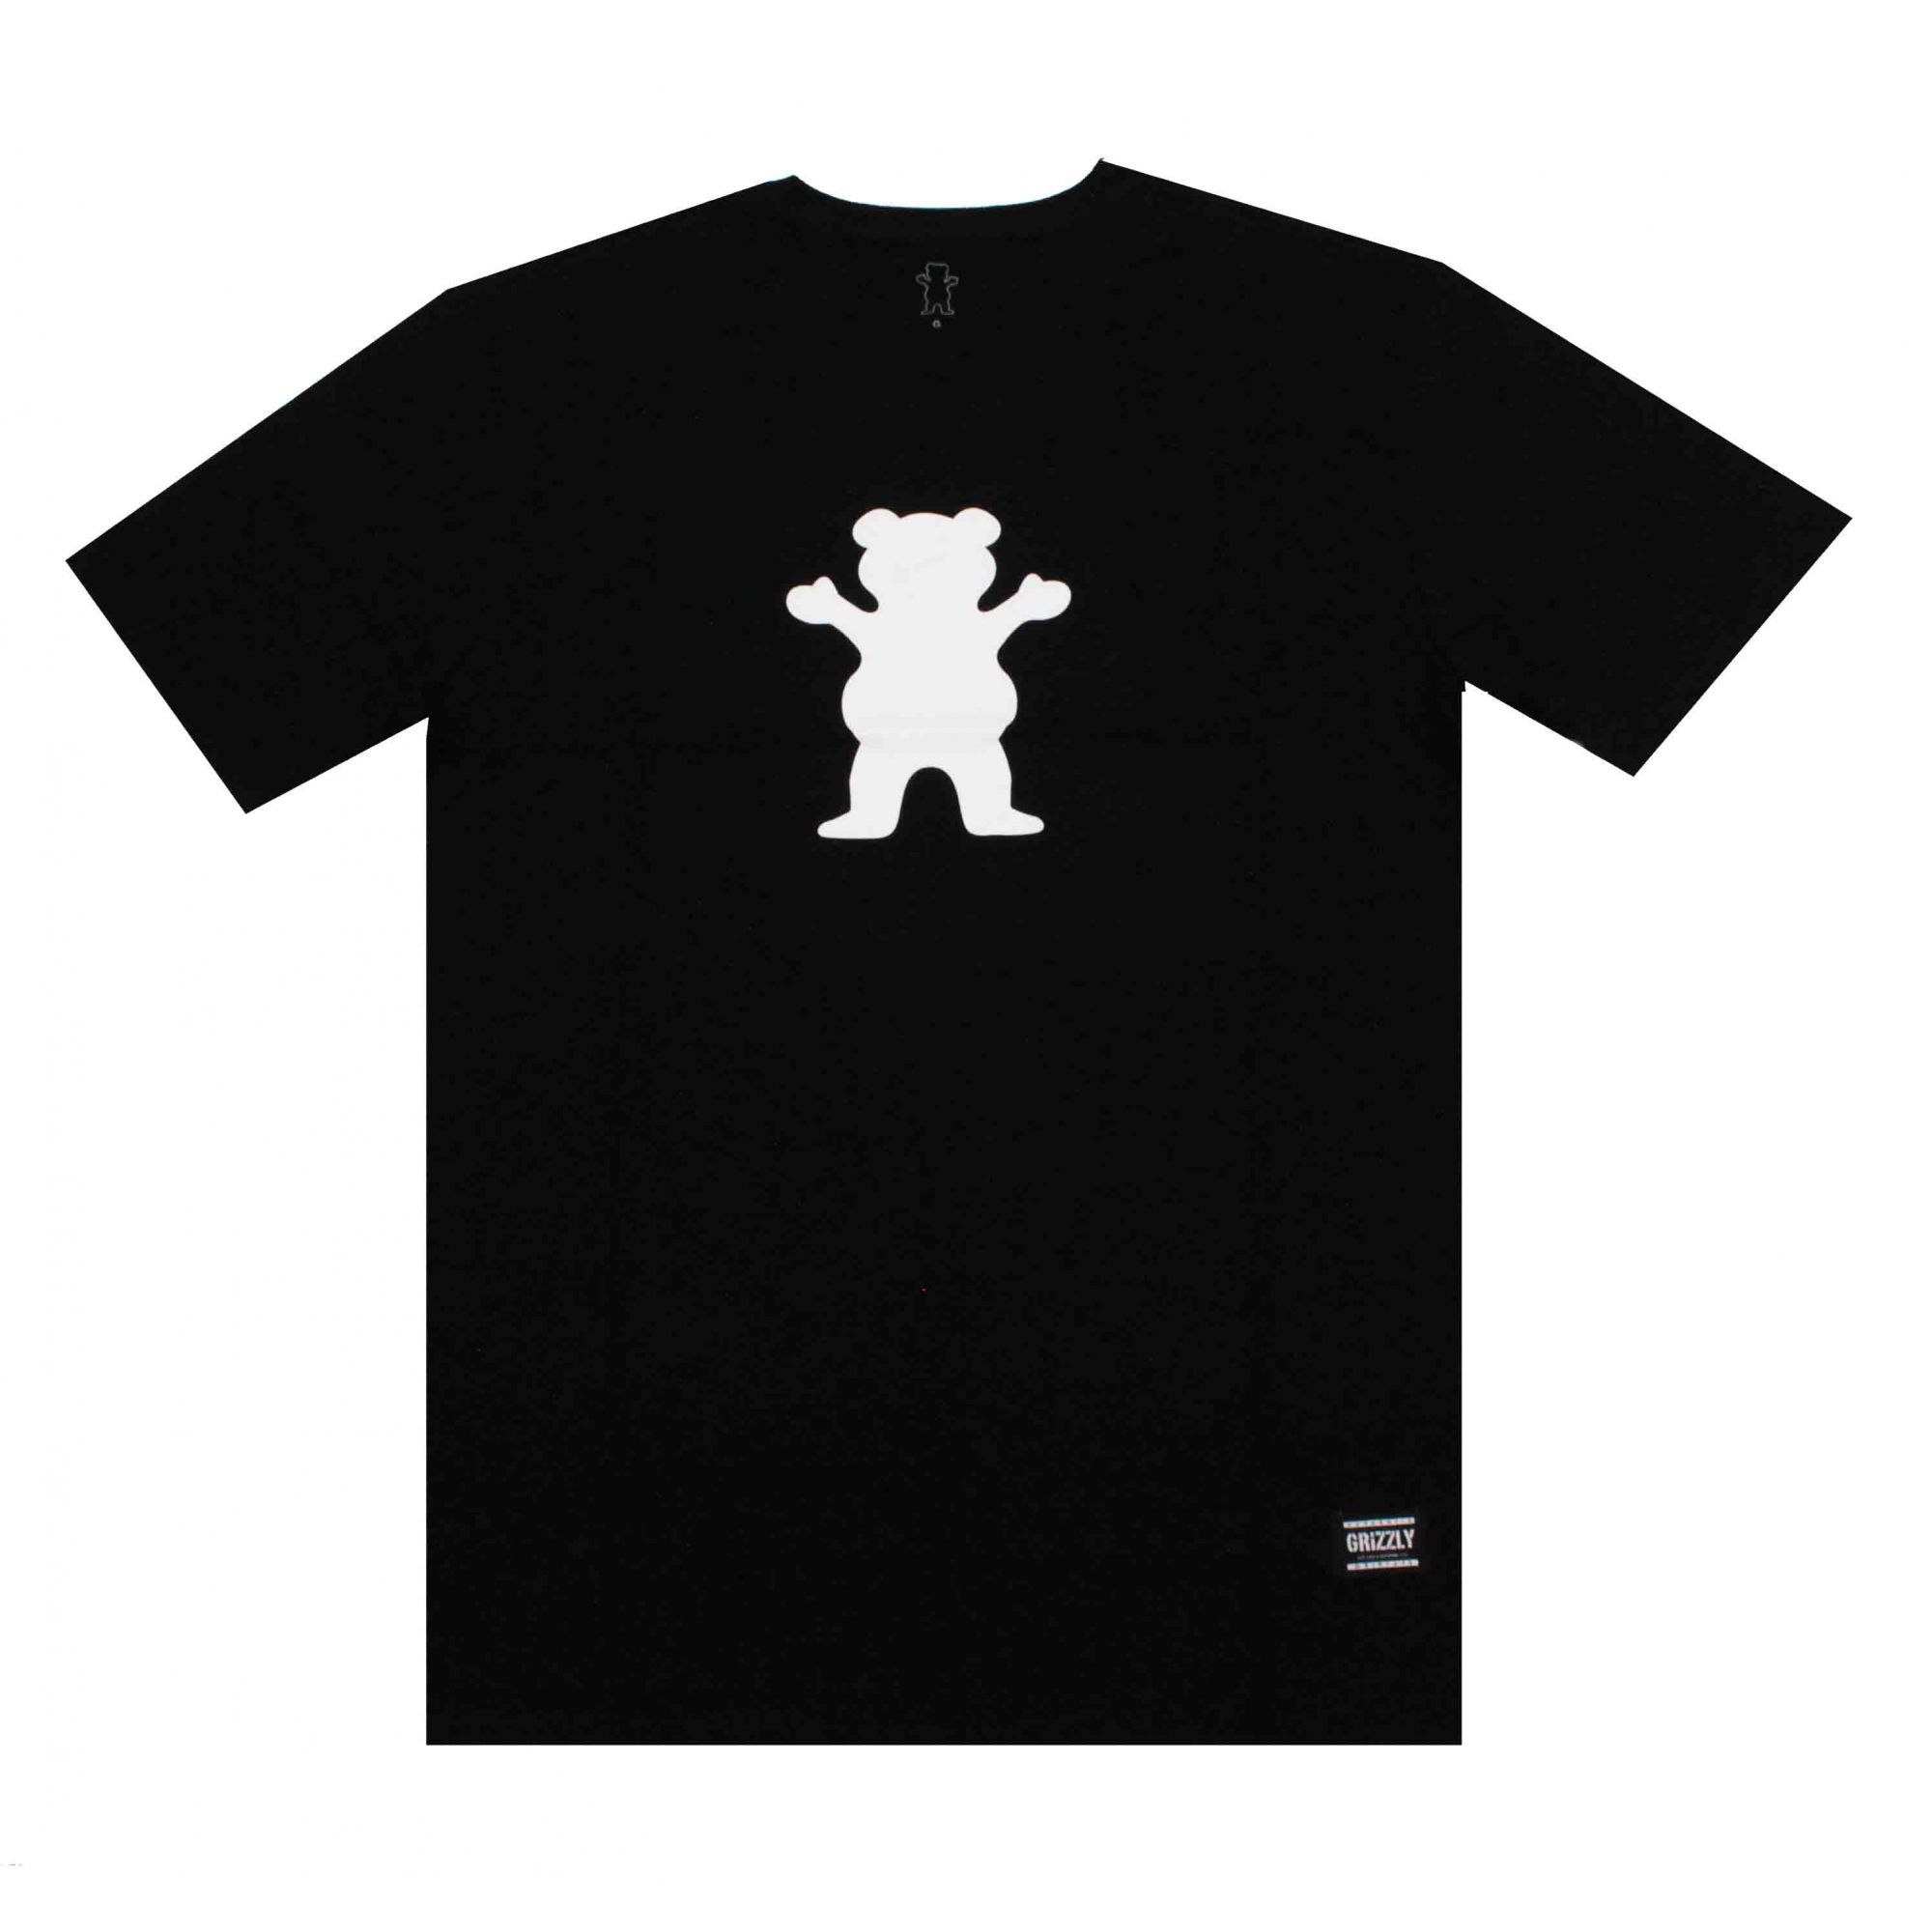 Camiseta Grizzly Og Bear Logo - Preto/Branco